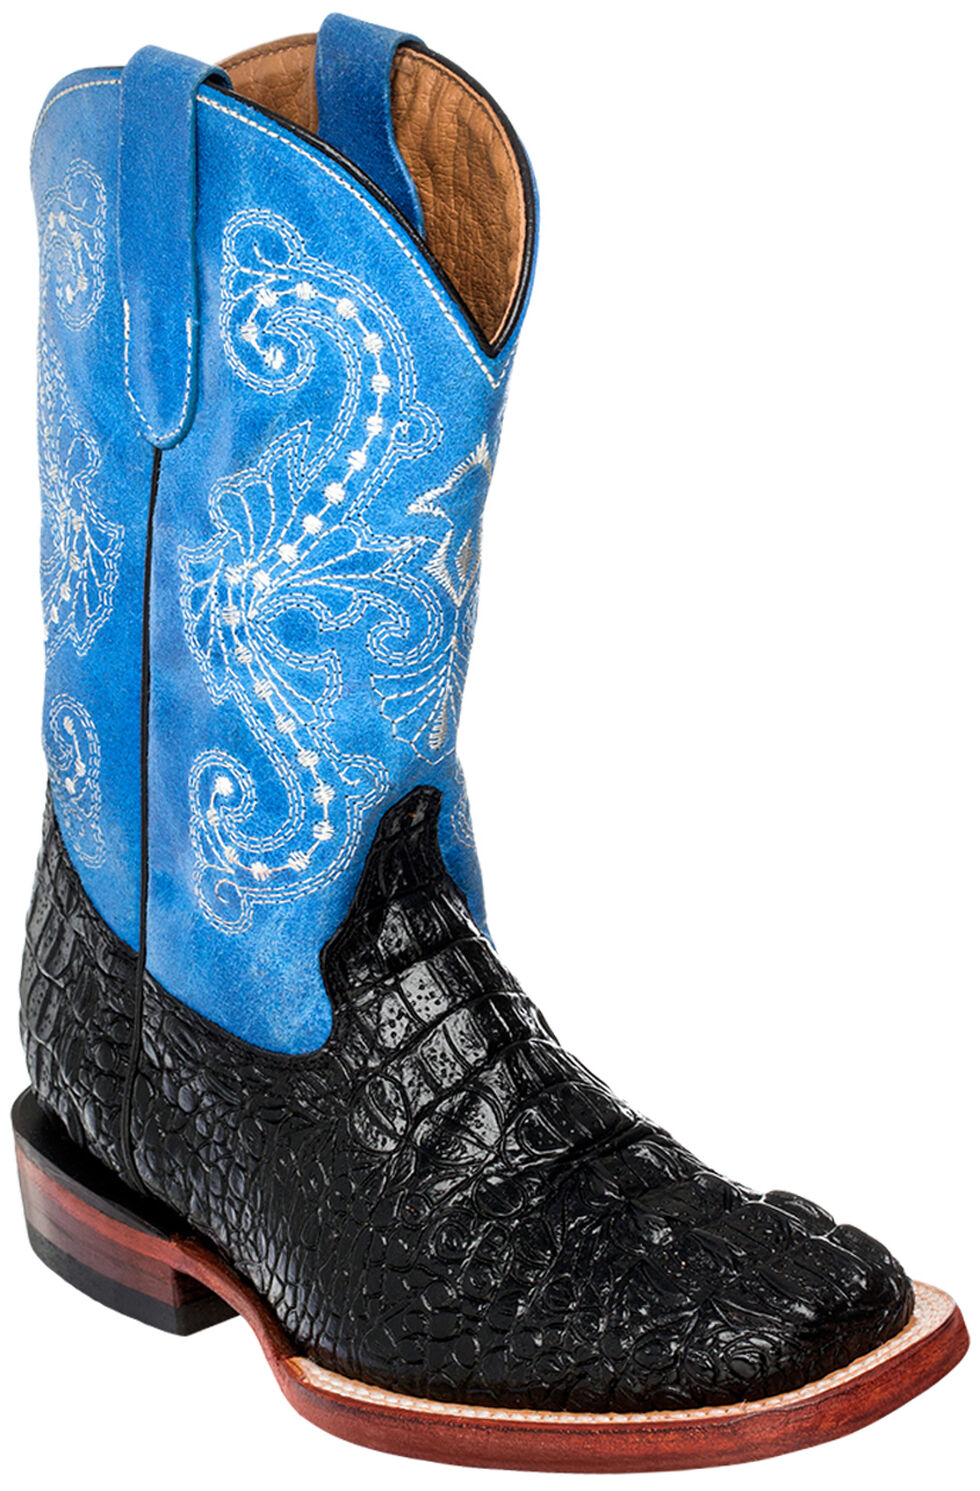 Ferrini Girls' Crocodile Print Cowgirl Boots - Square Toe, Black Ink, hi-res